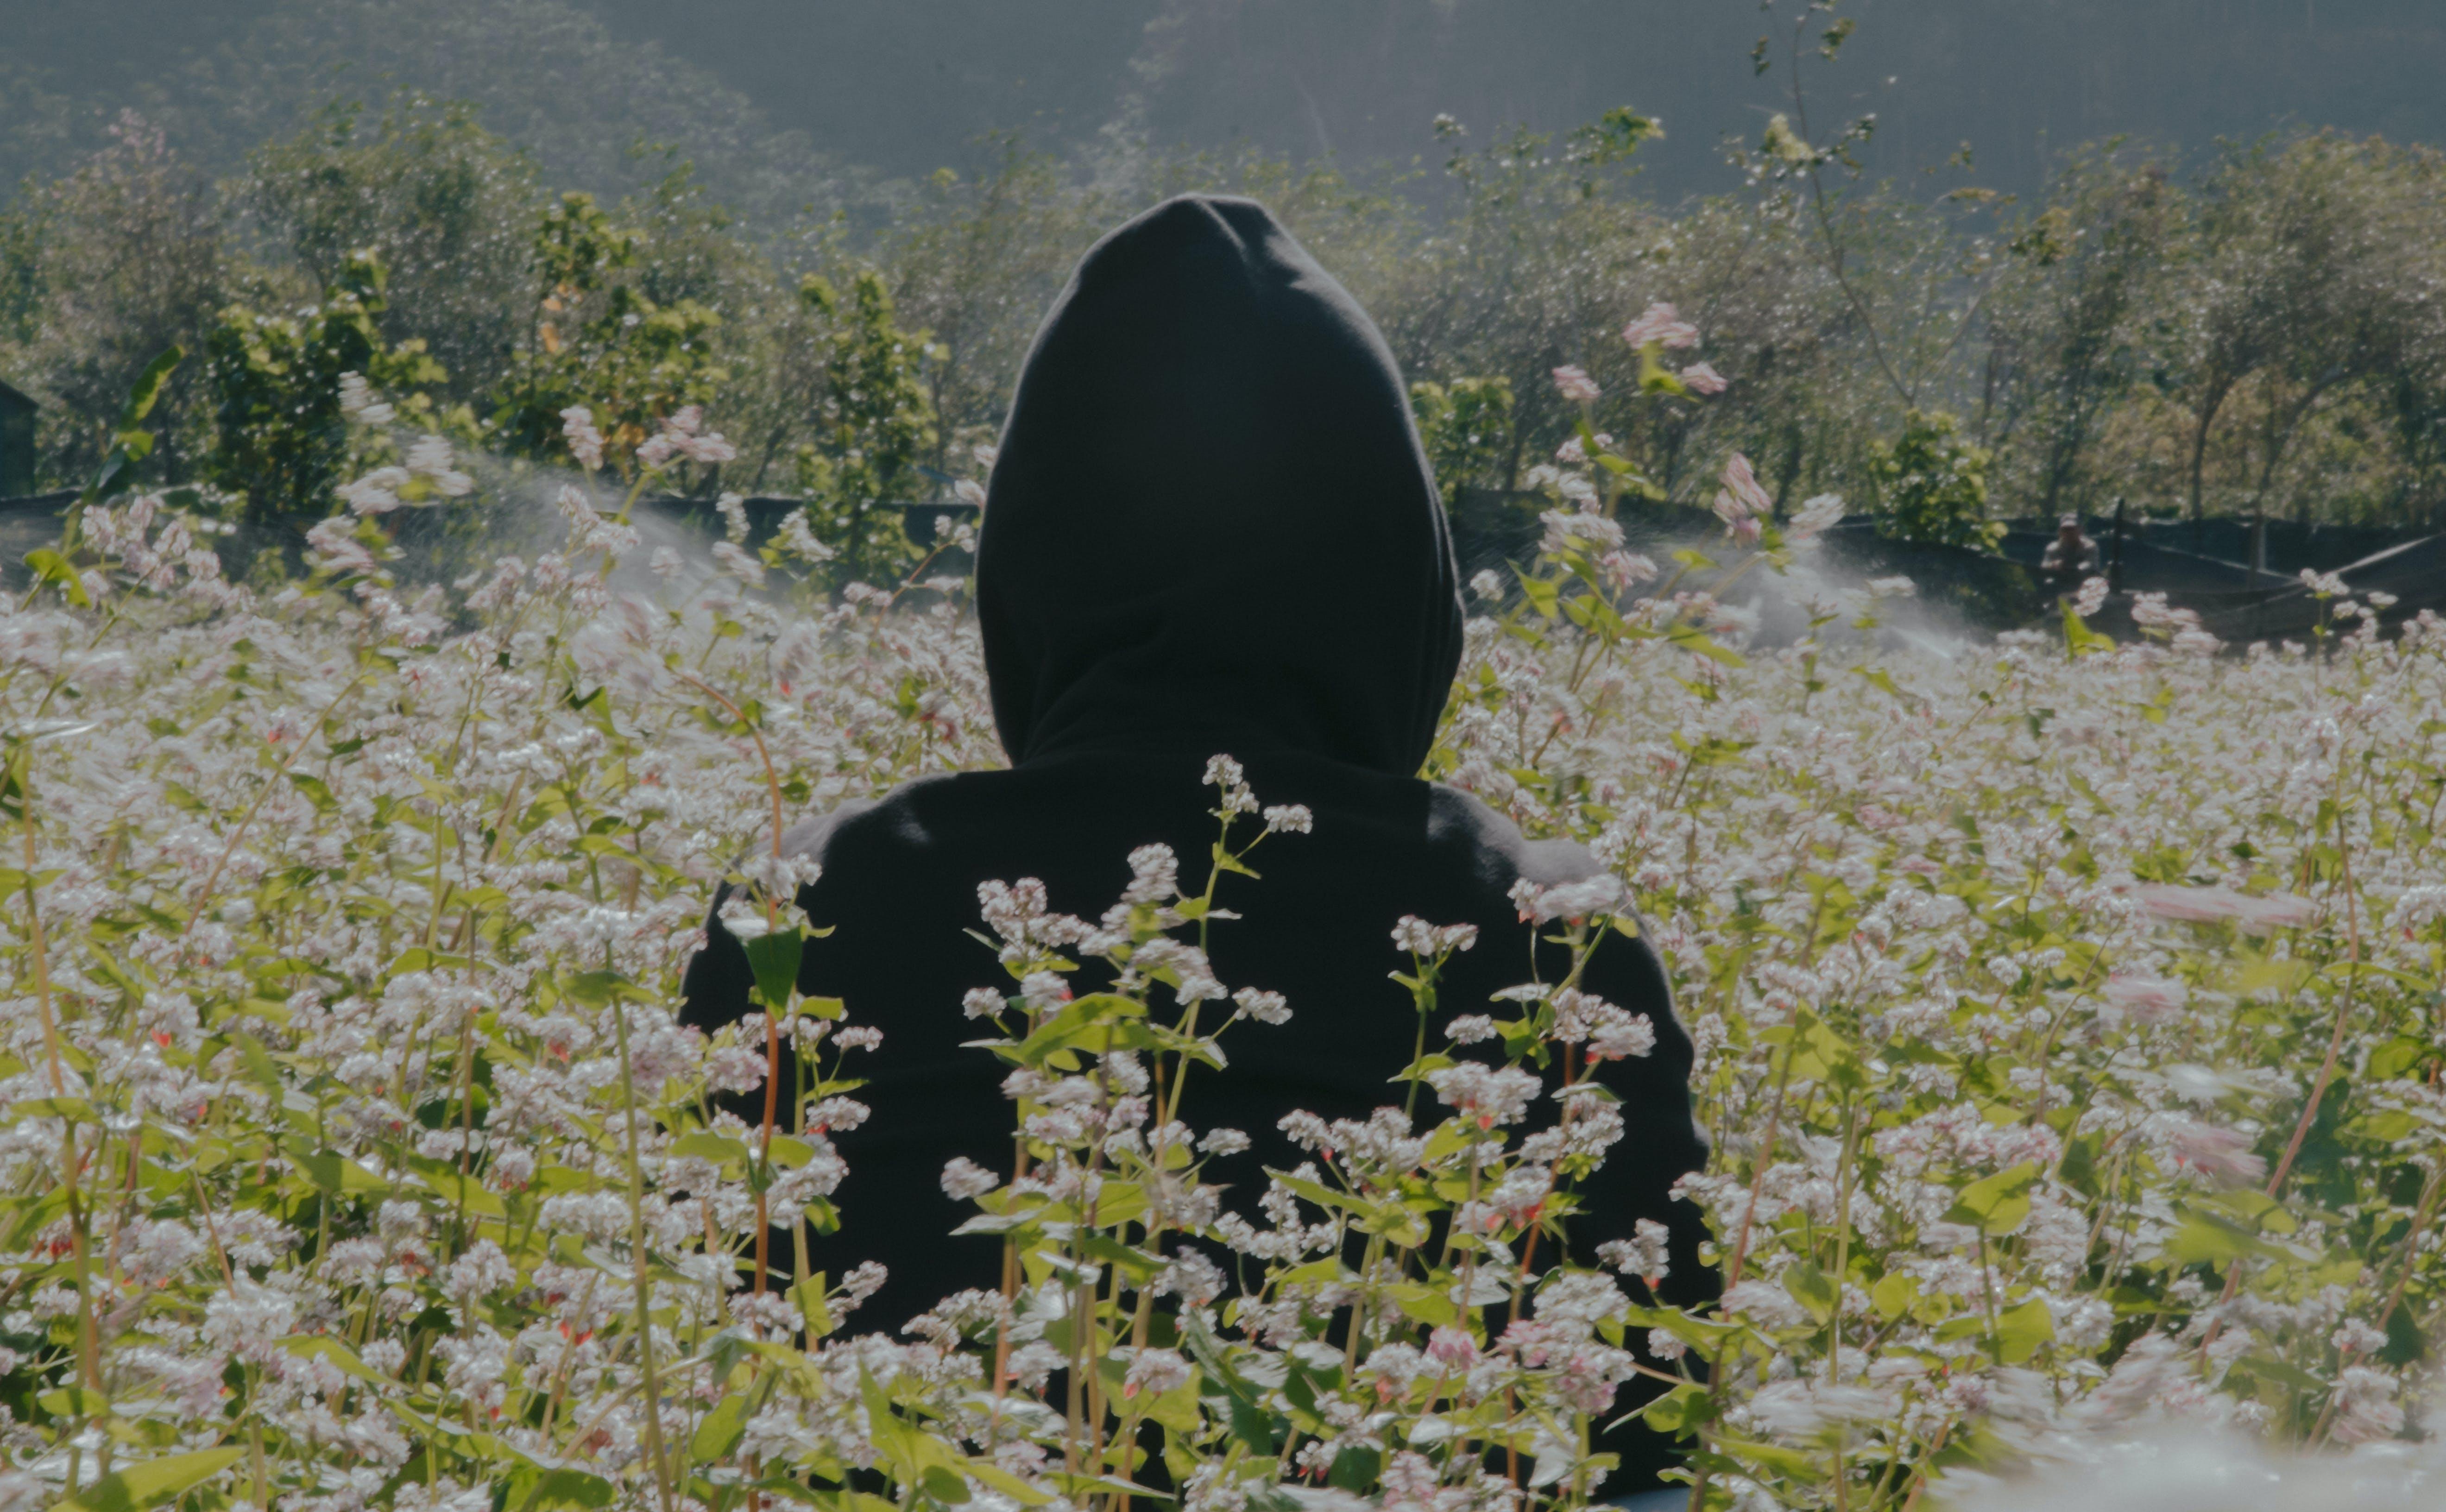 Photo of Person Wearing Black Hoodie Standing On Flower Field